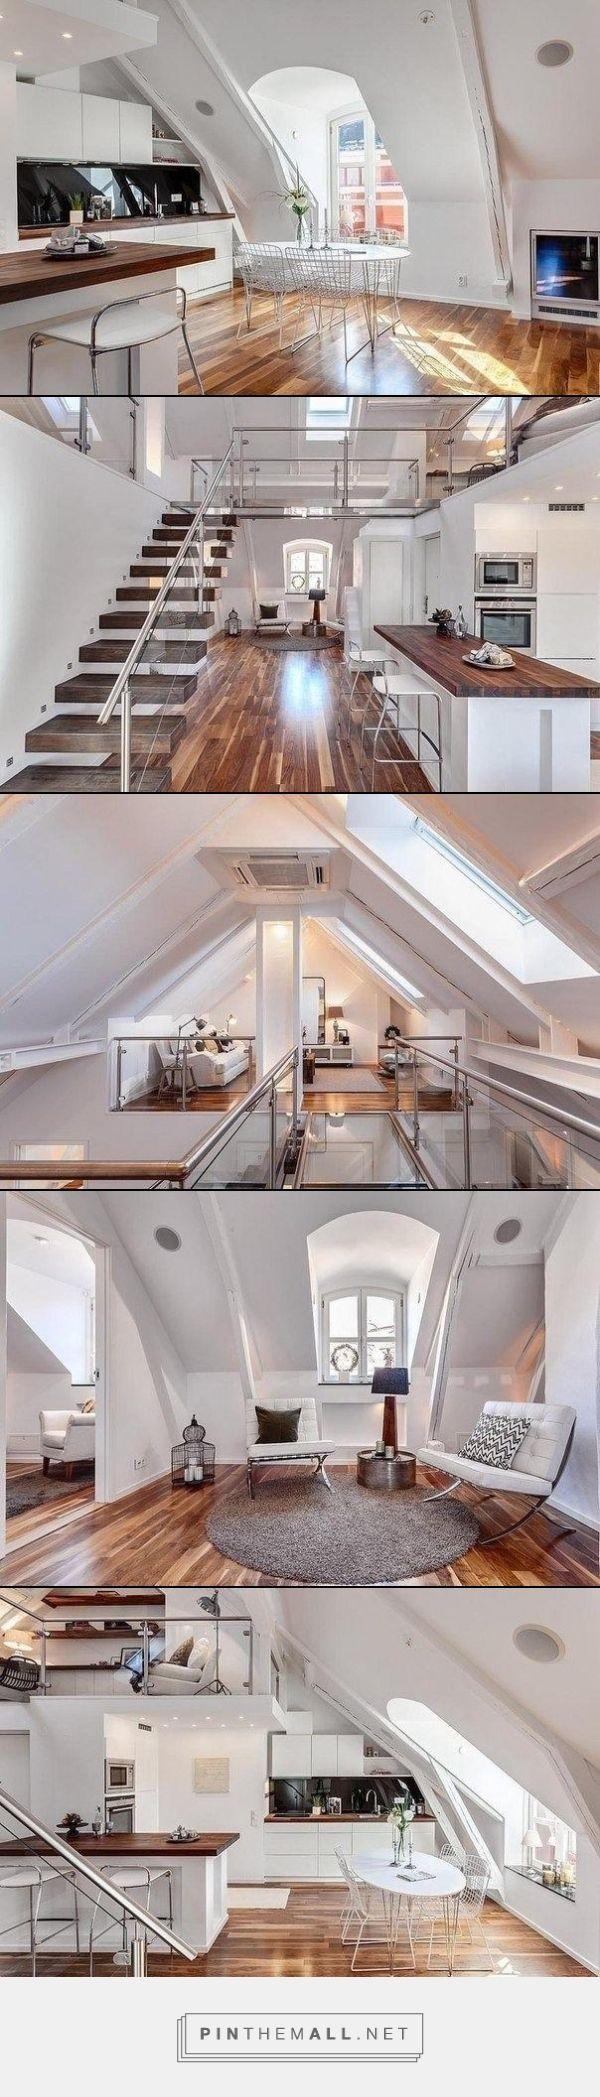 beautiful contemporary house - created via https://pinthemall.net